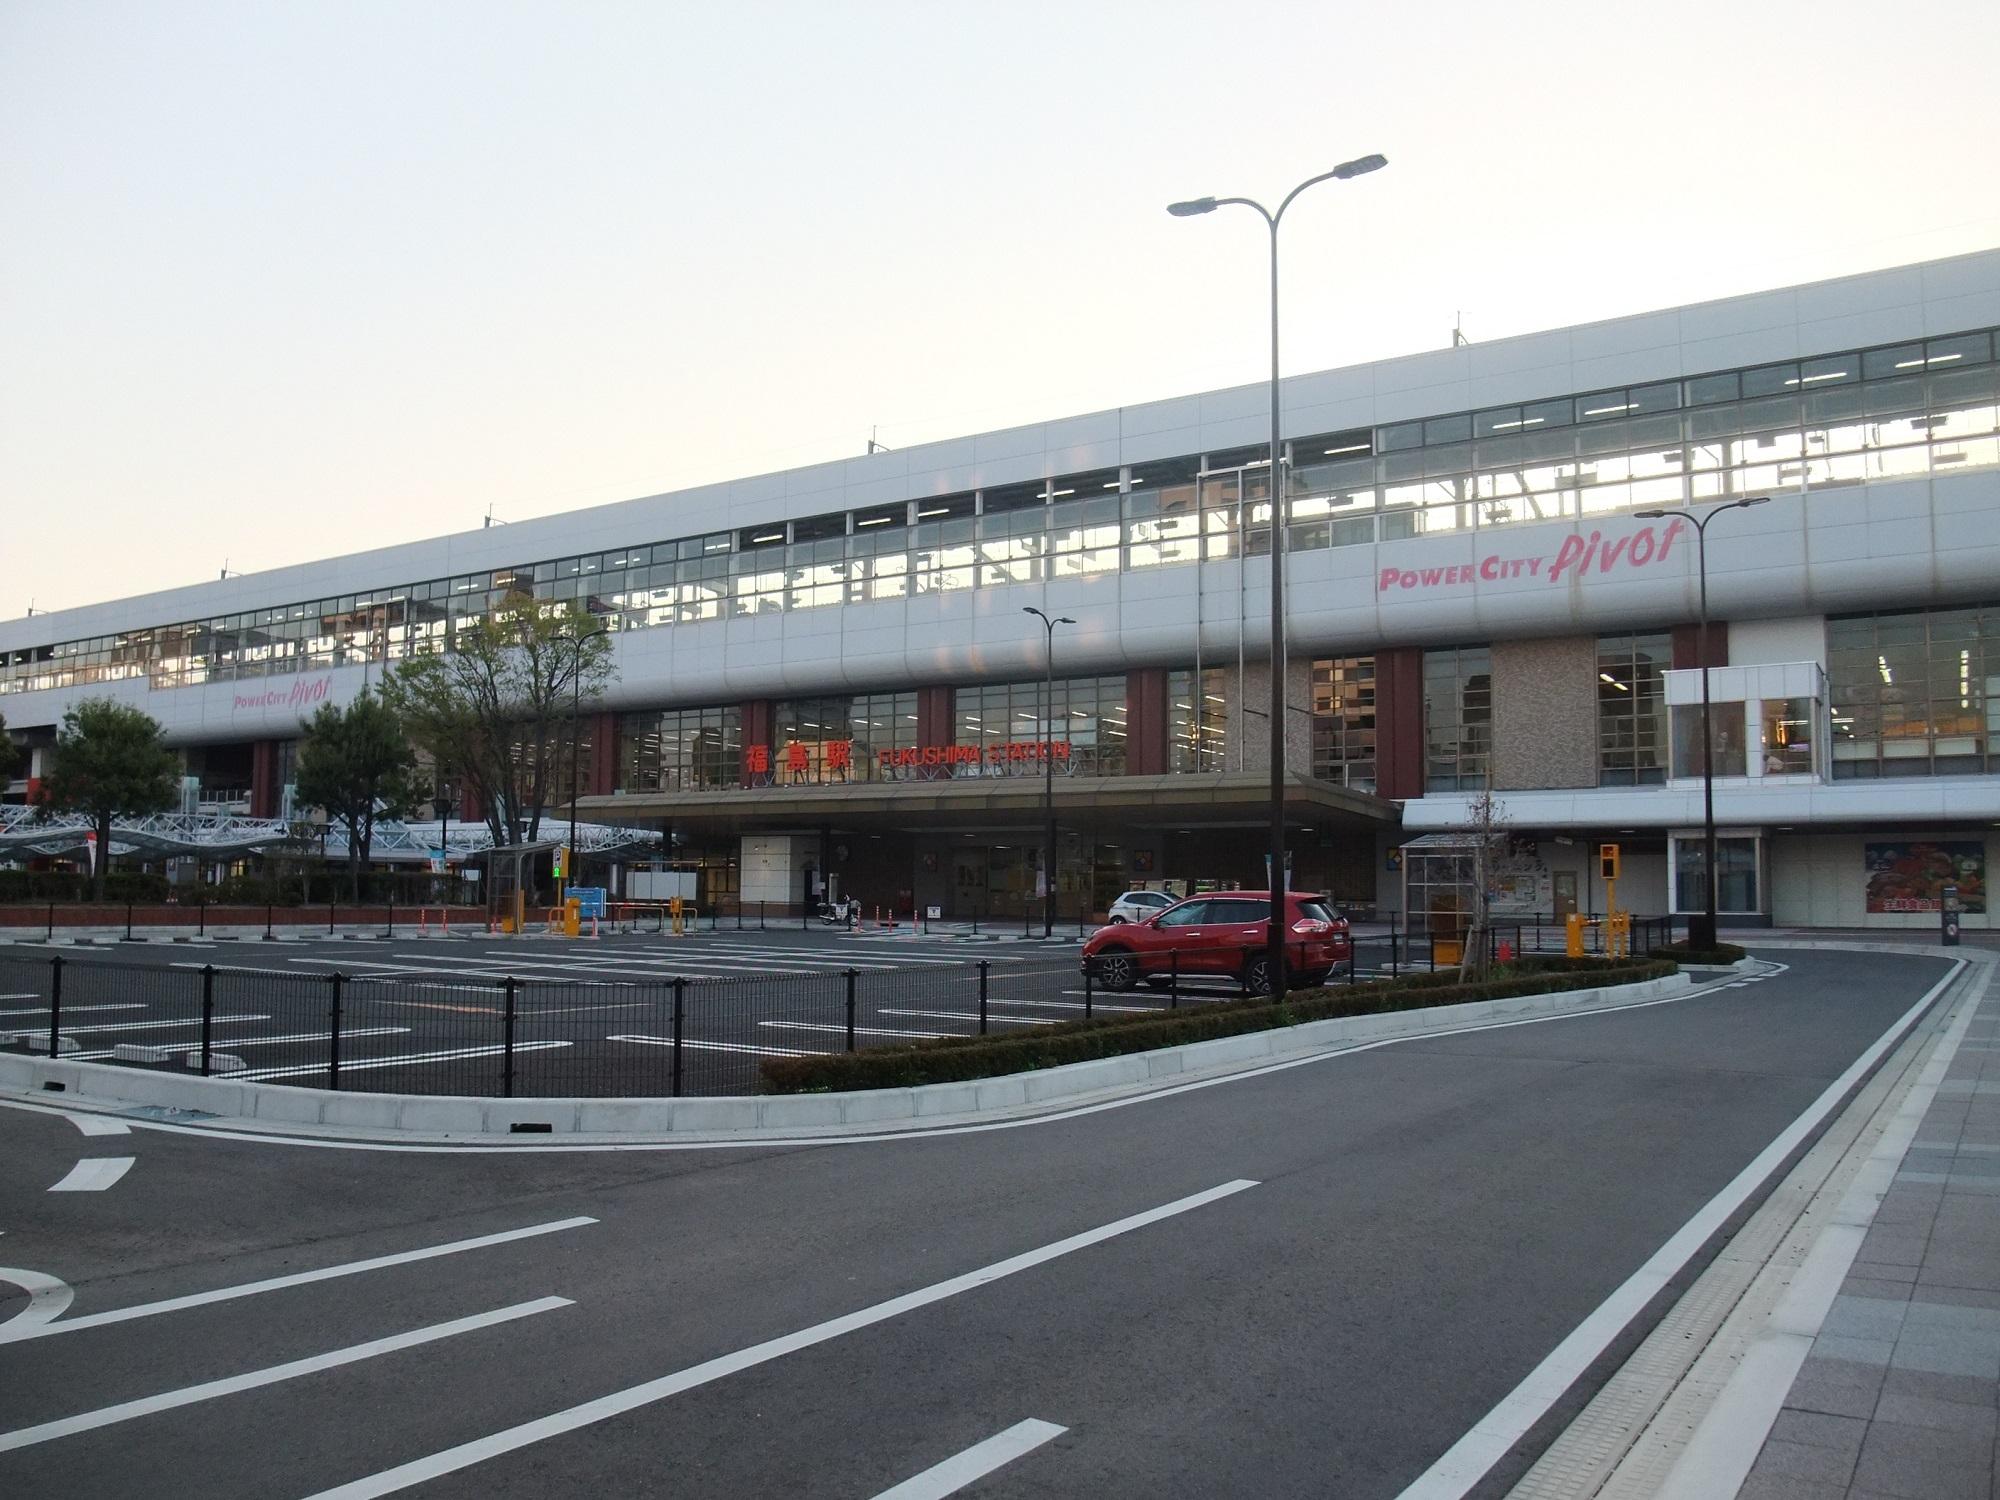 福島駅 (福島県) - Wikiwand